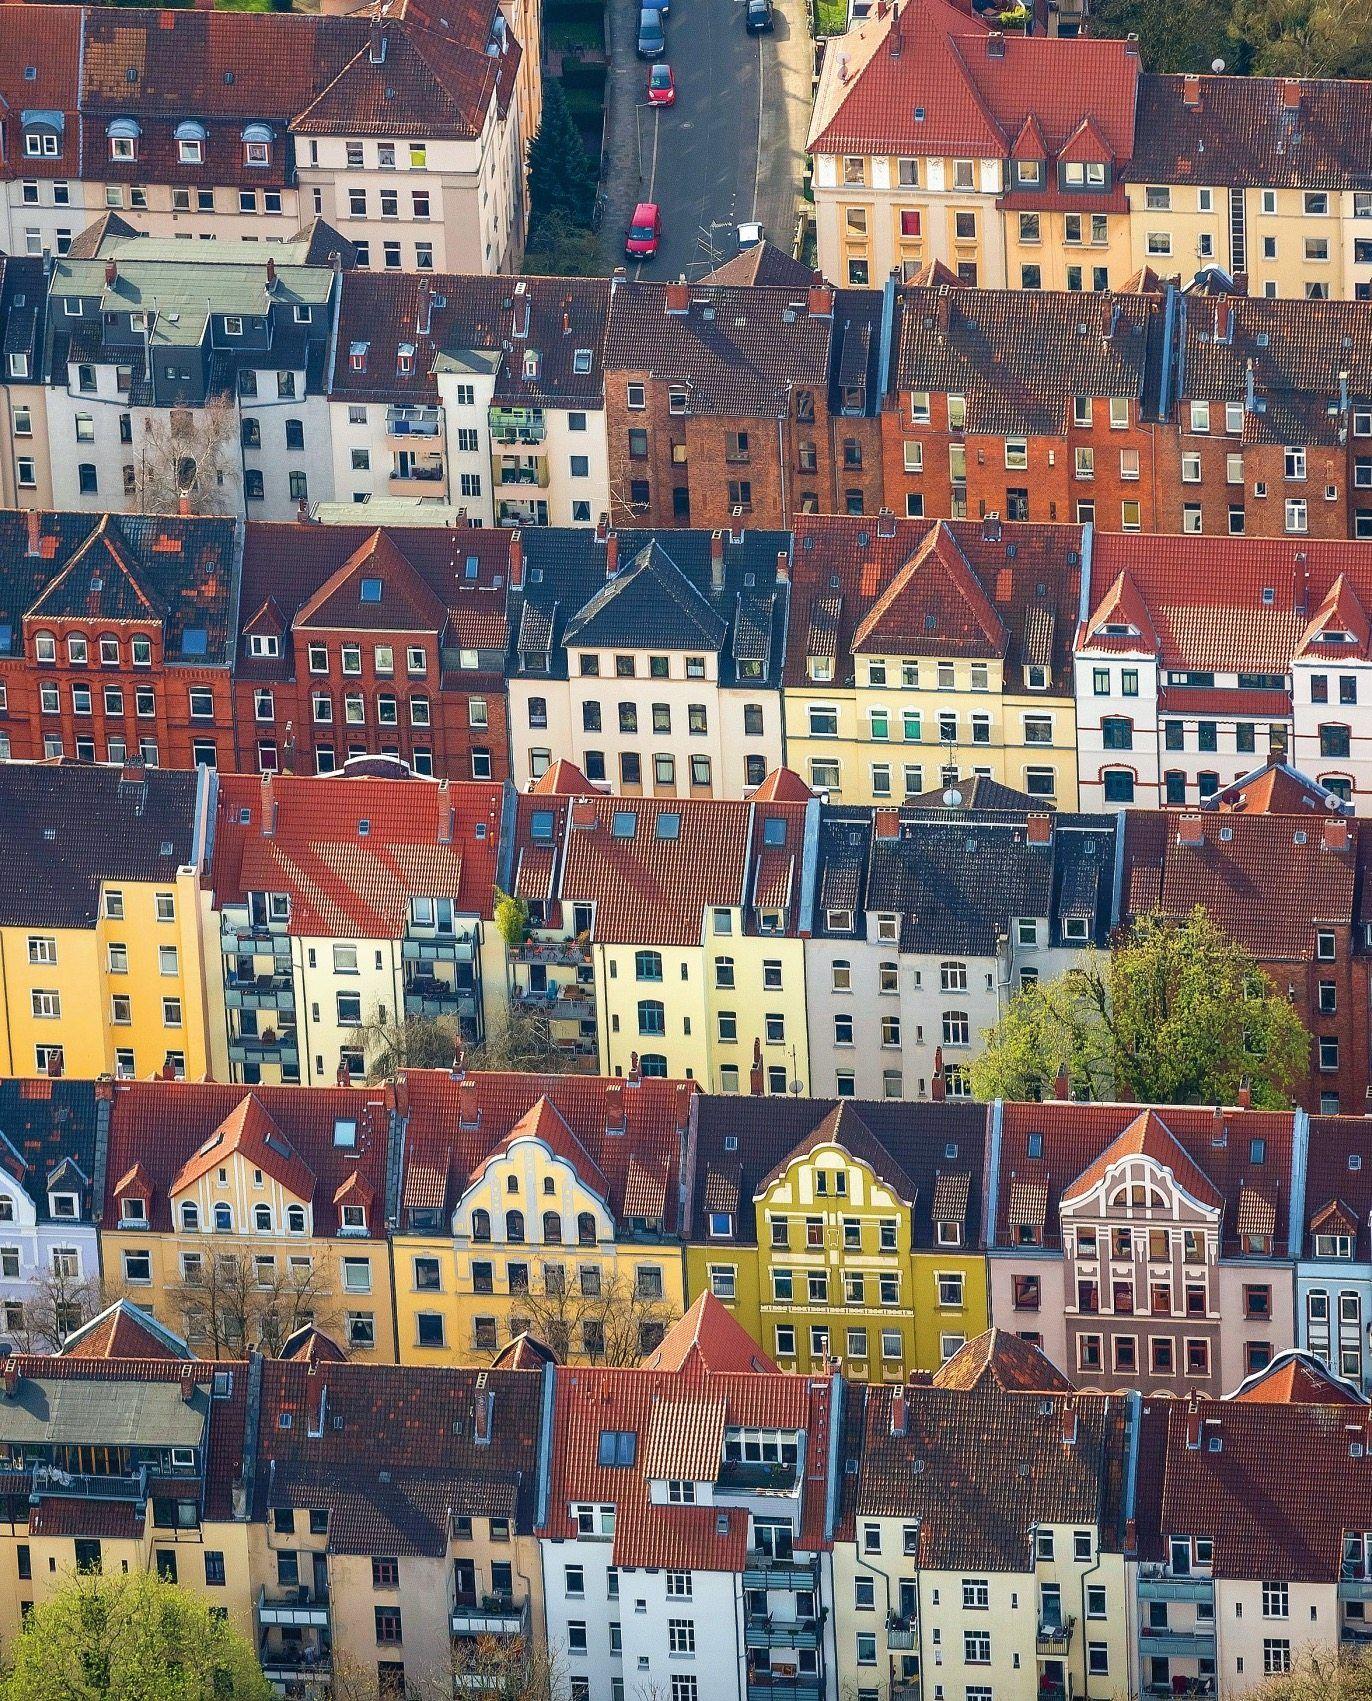 Wohngebiet in Hannover